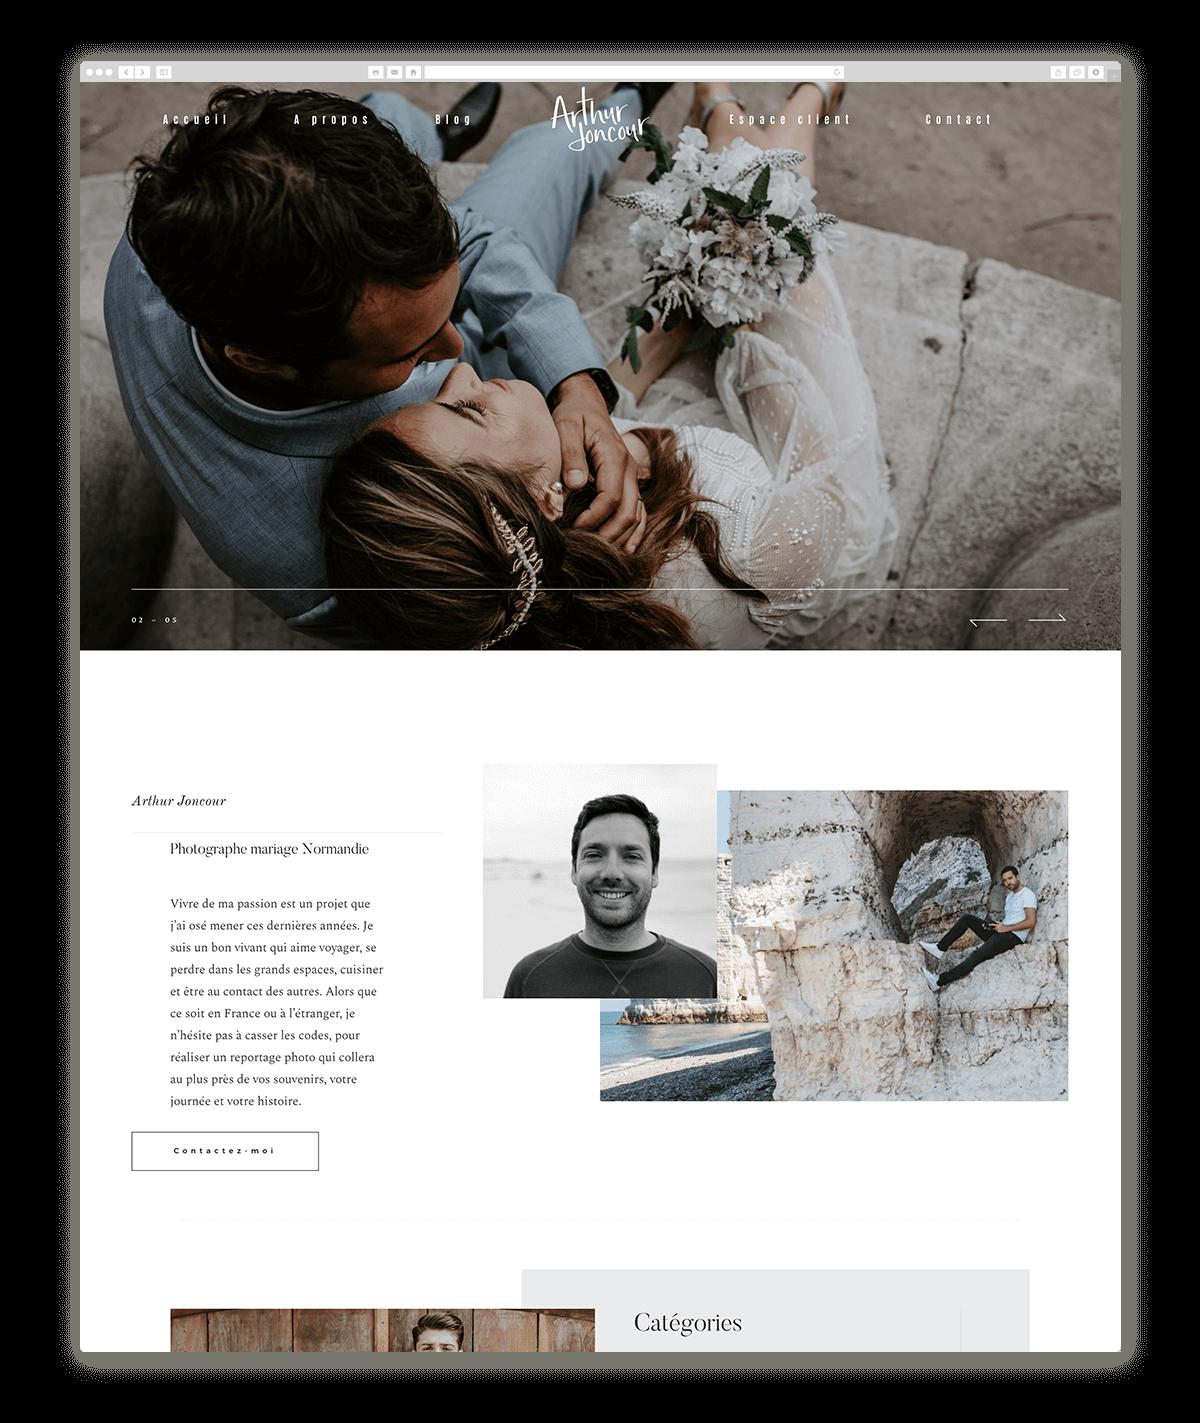 Arthur Joncourt wedding photographer website design based on Leon, by Flothemes, France